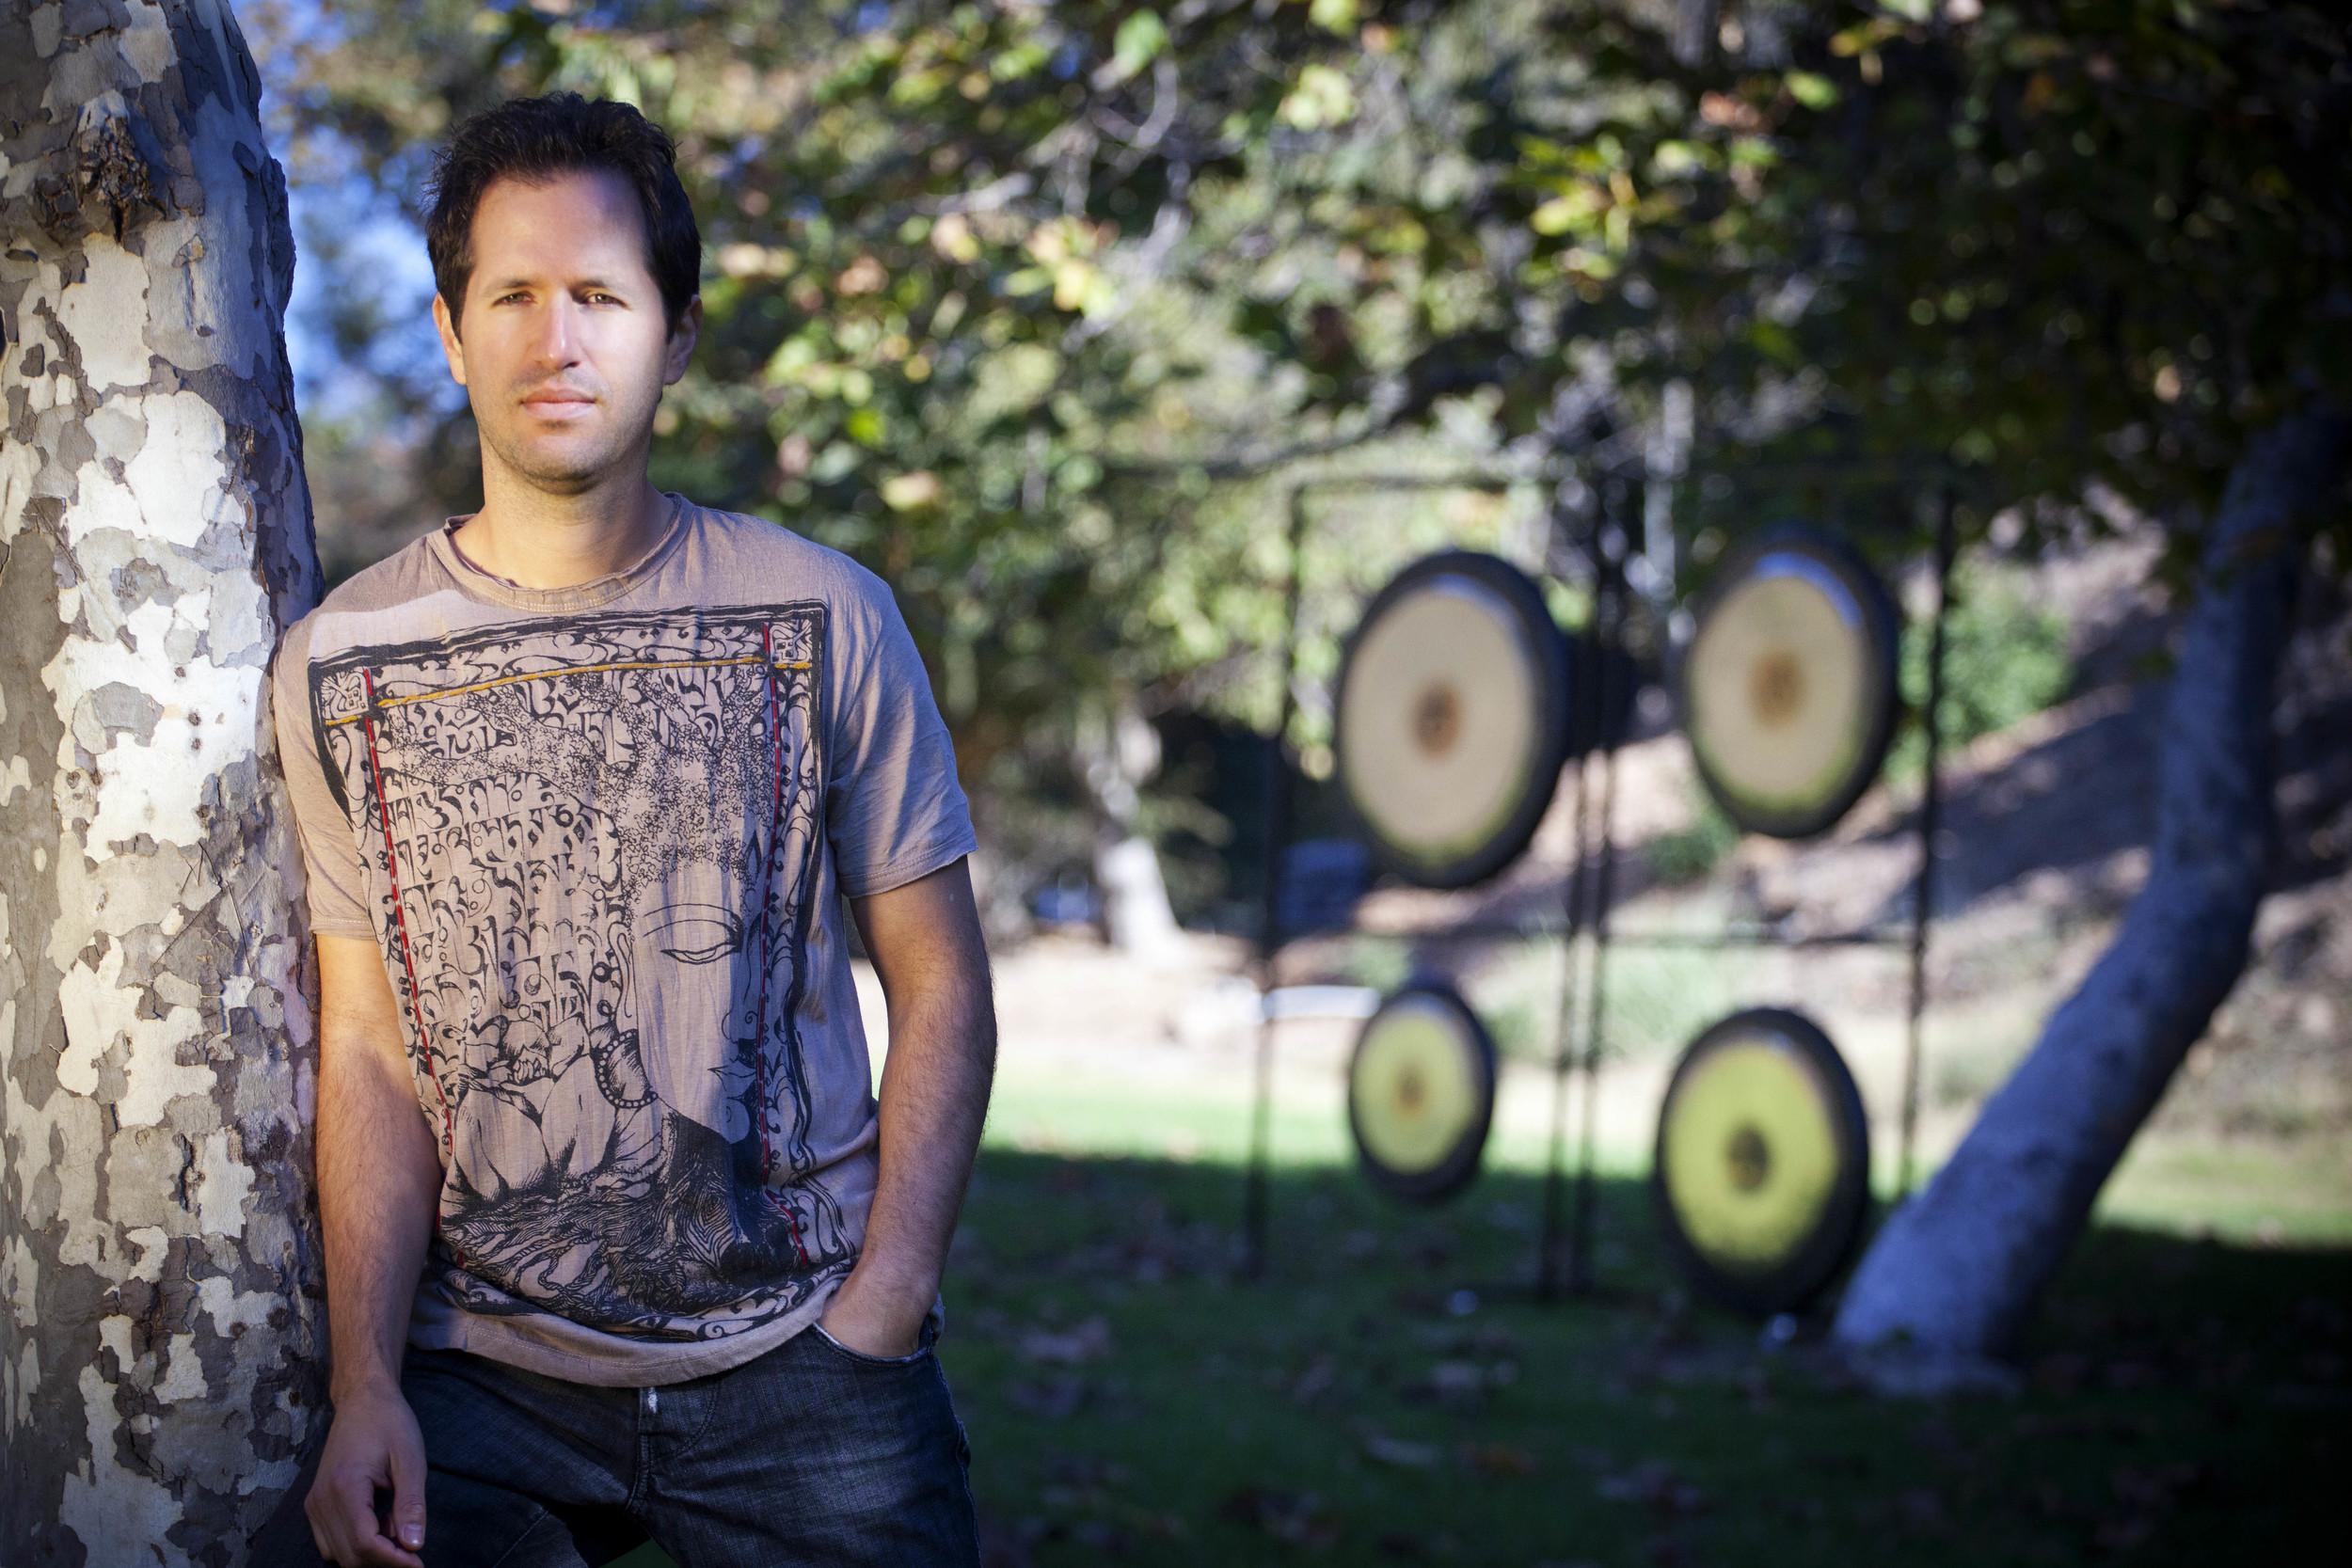 Gong photo shoot in Malibu, CA (photo by Selen Ermanav)